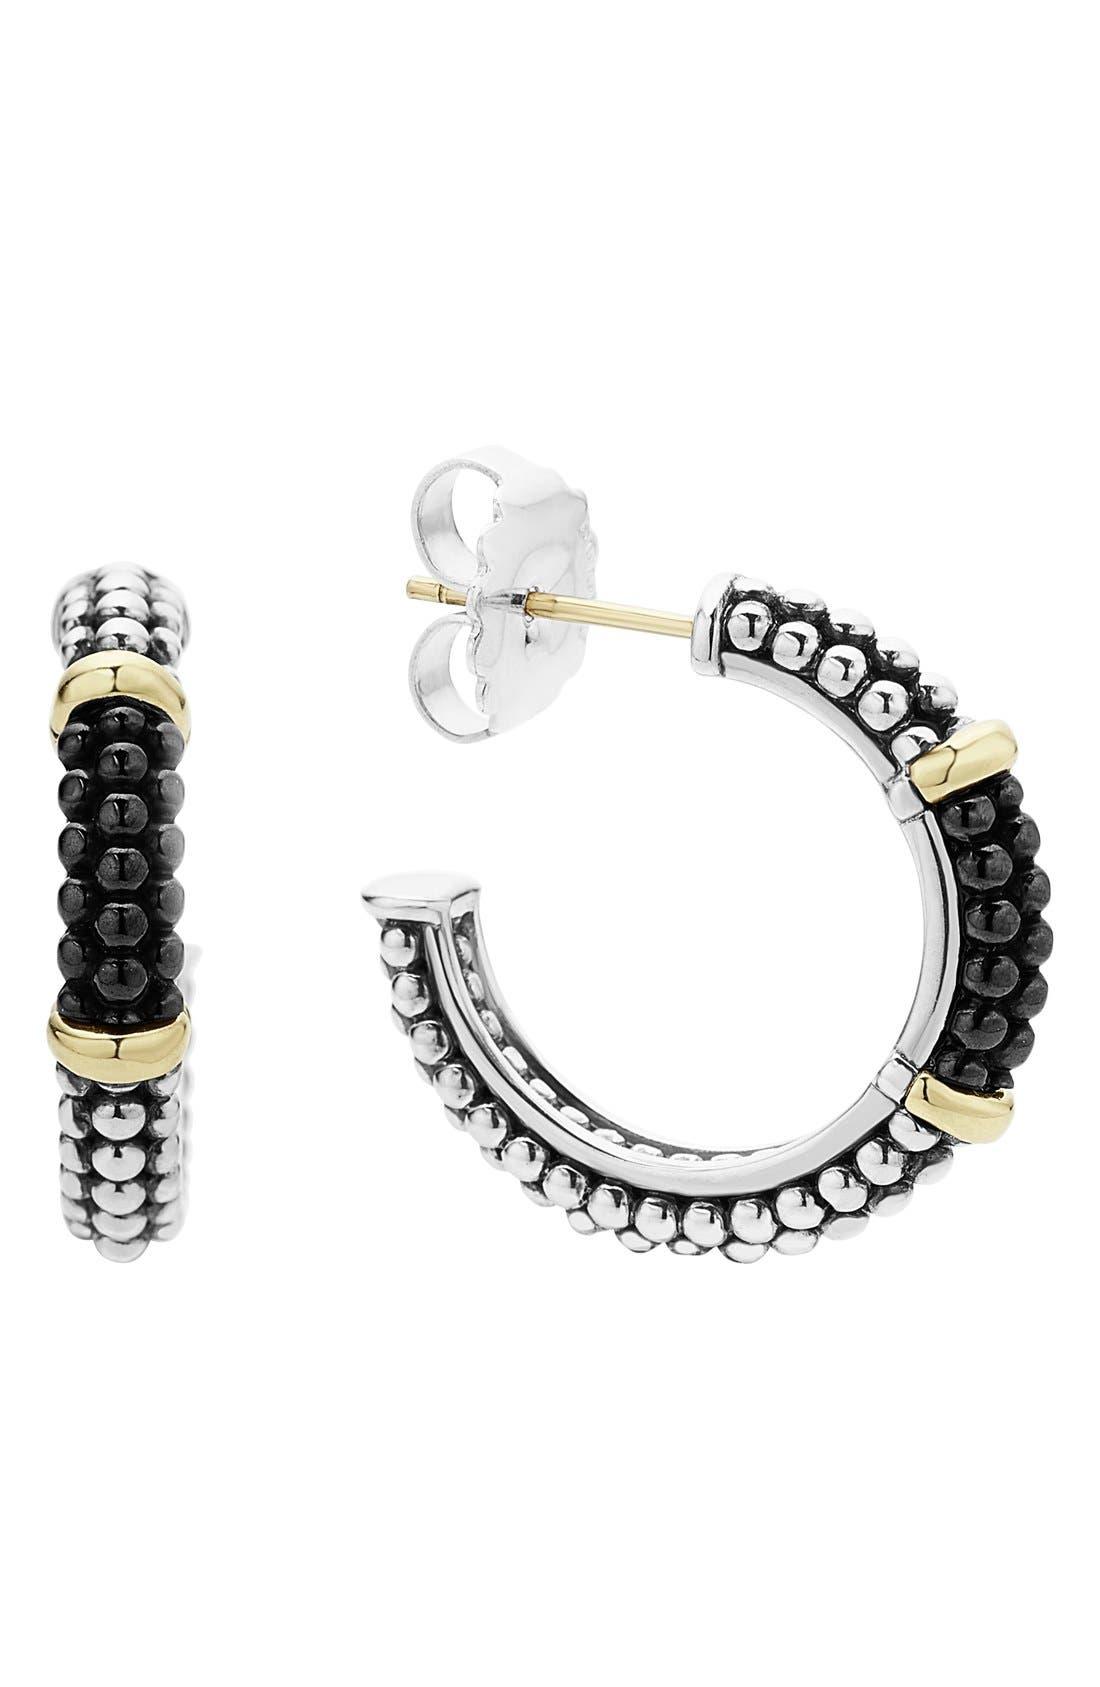 LAGOS 'Black & White Caviar' Hoop Earrings, Main, color, 001